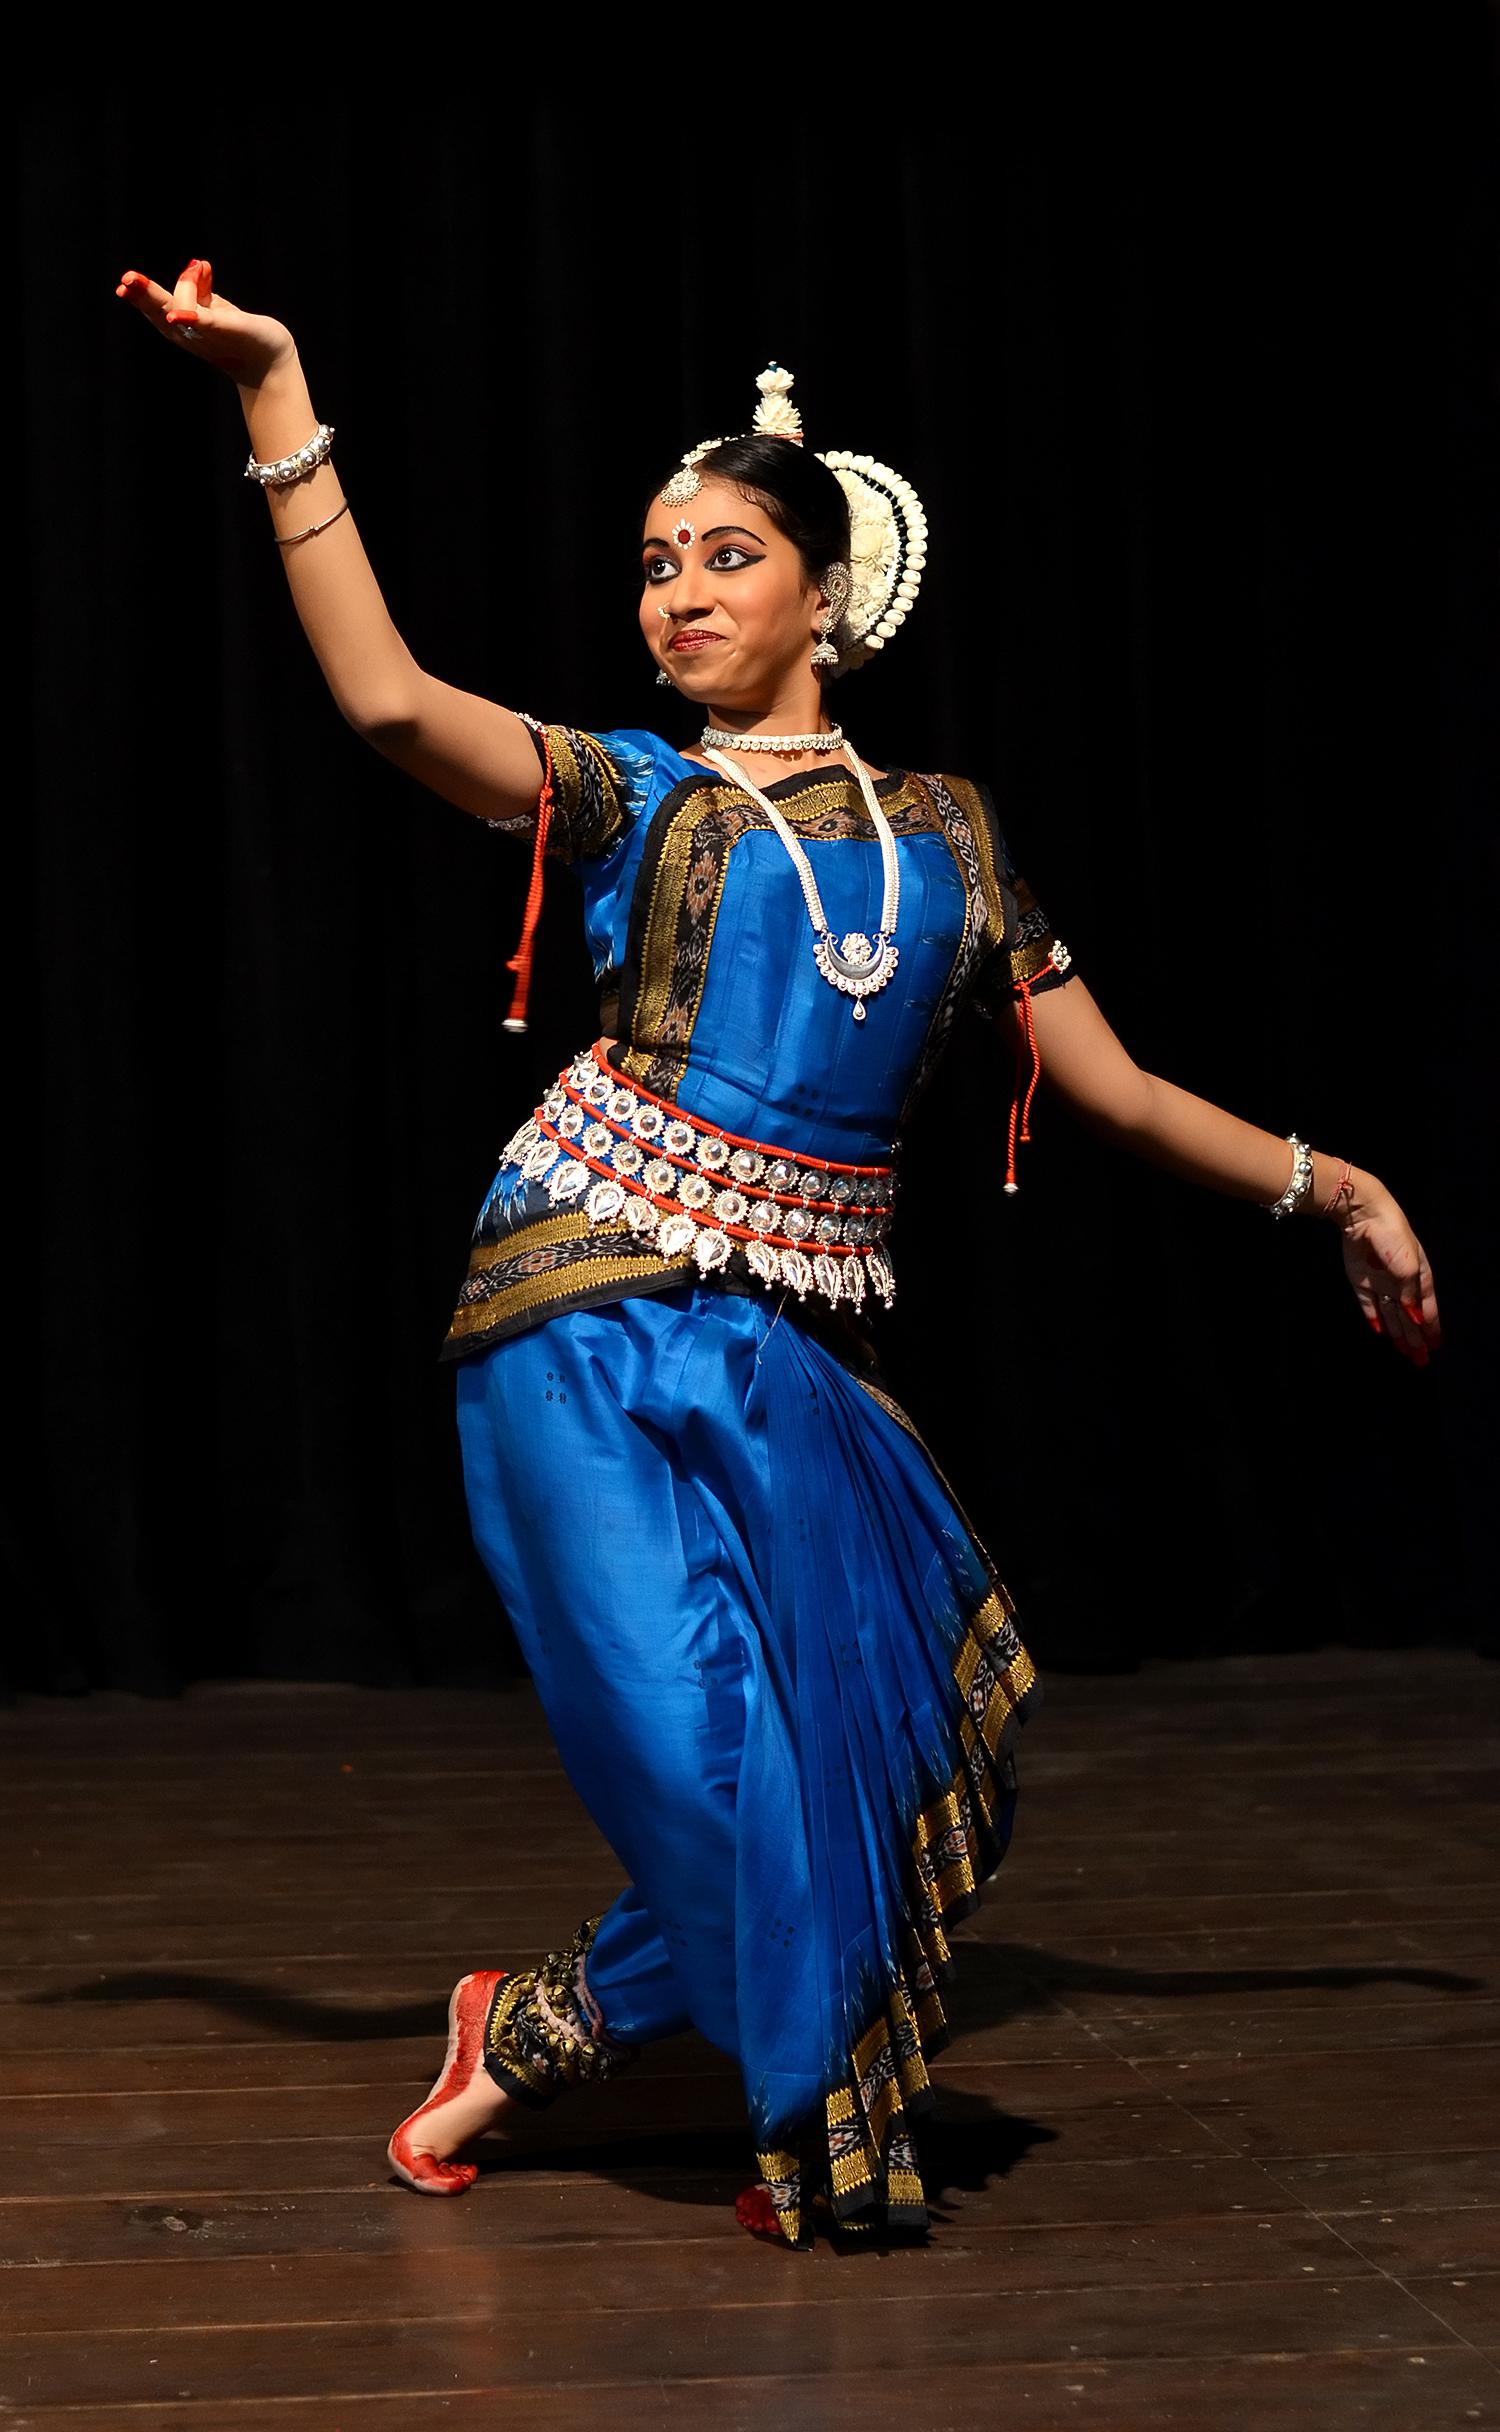 Gambar Tarian India : gambar, tarian, india, Tarian, Odissi, Wikipedia, Bahasa, Melayu,, Ensiklopedia, Bebas